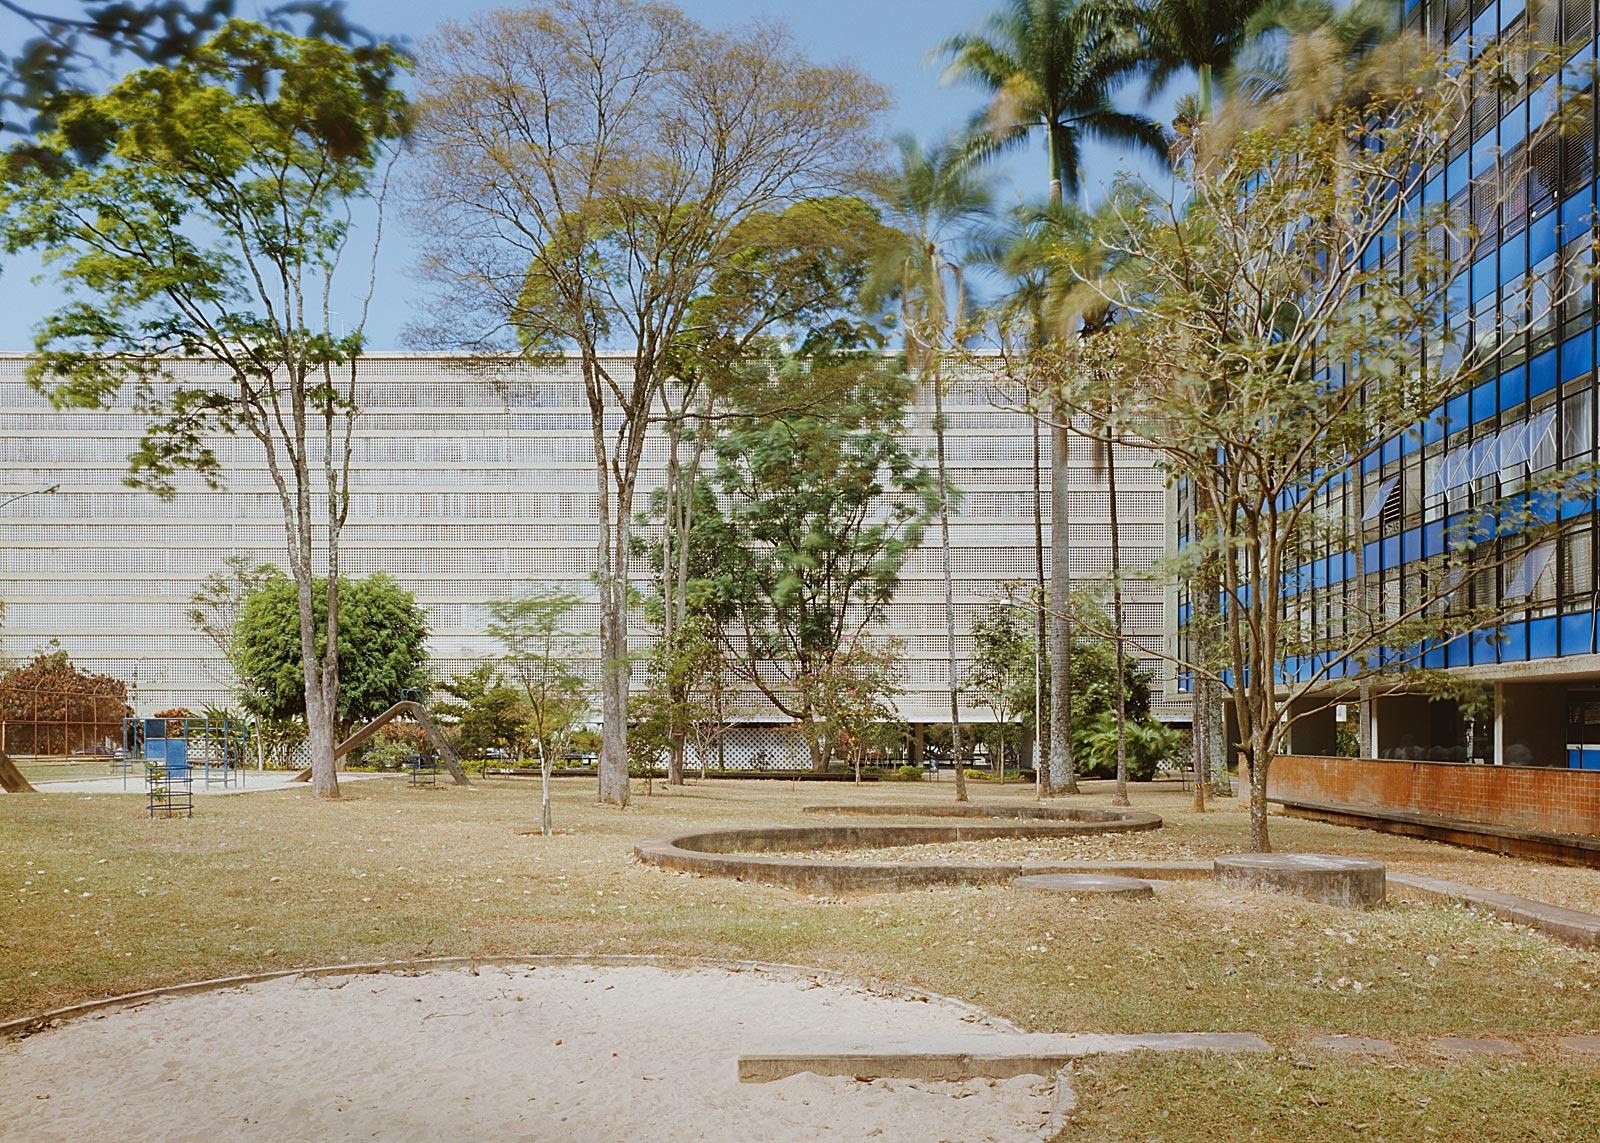 Superquadra Sul 308, Brasilia